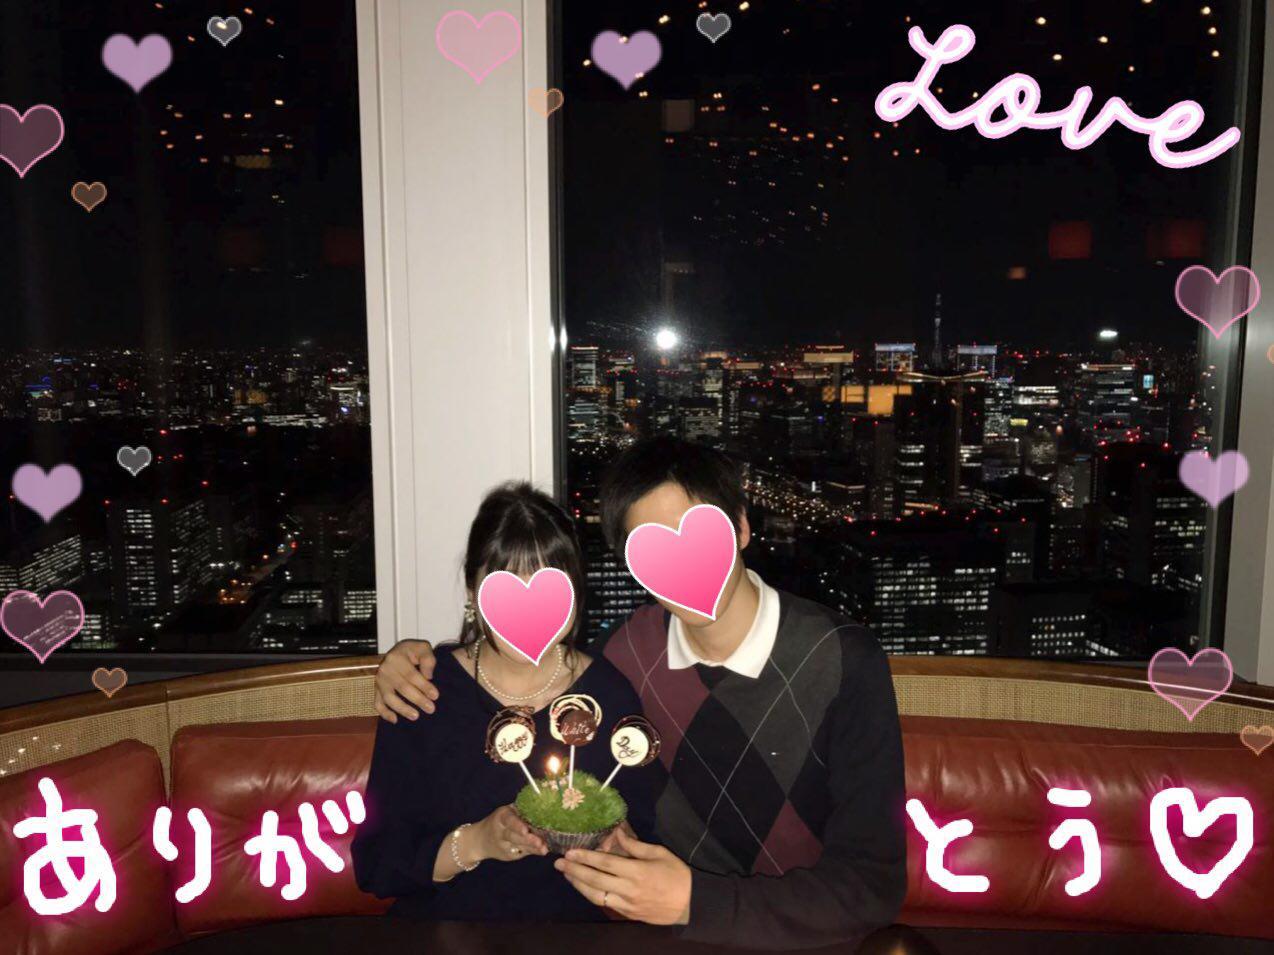 photo_2018-04-18_22-35-43.jpg